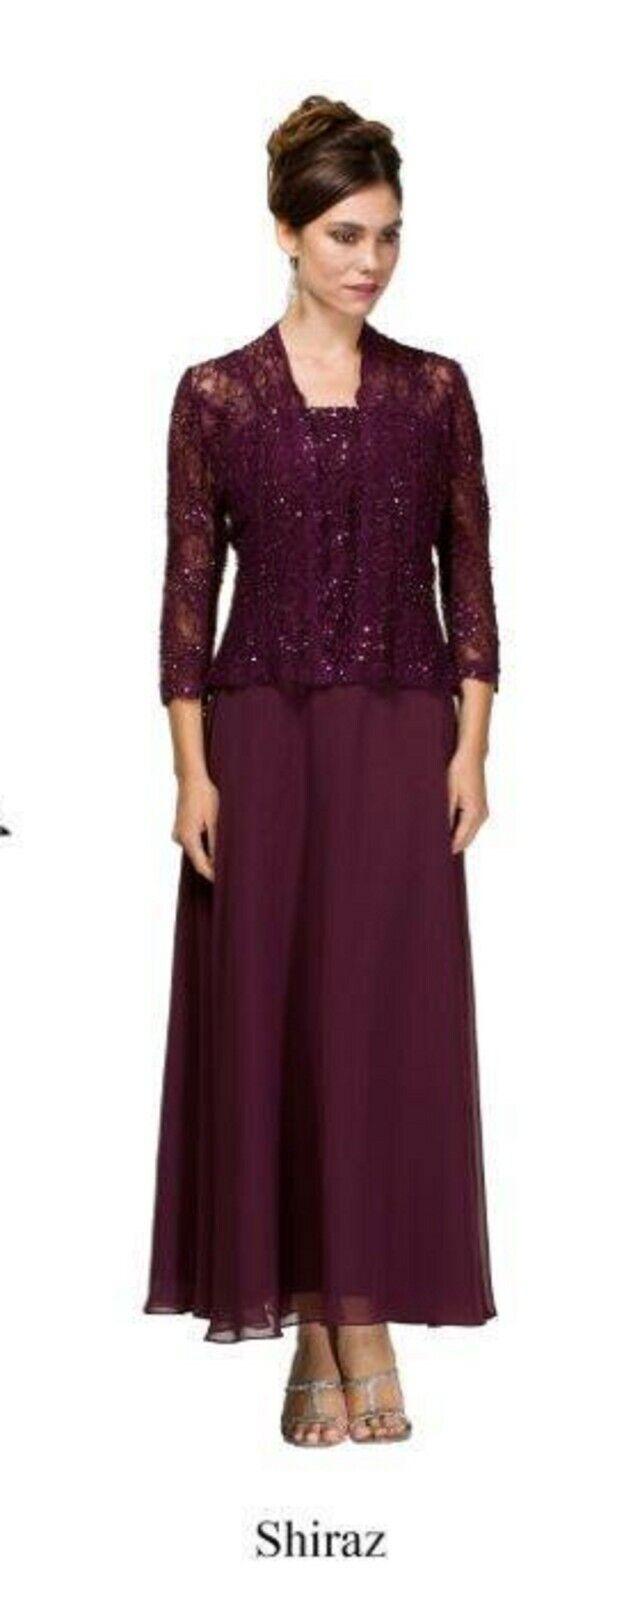 NWT Shiraz size 12 lace long formal gown/jacket, Emma Street ES6540